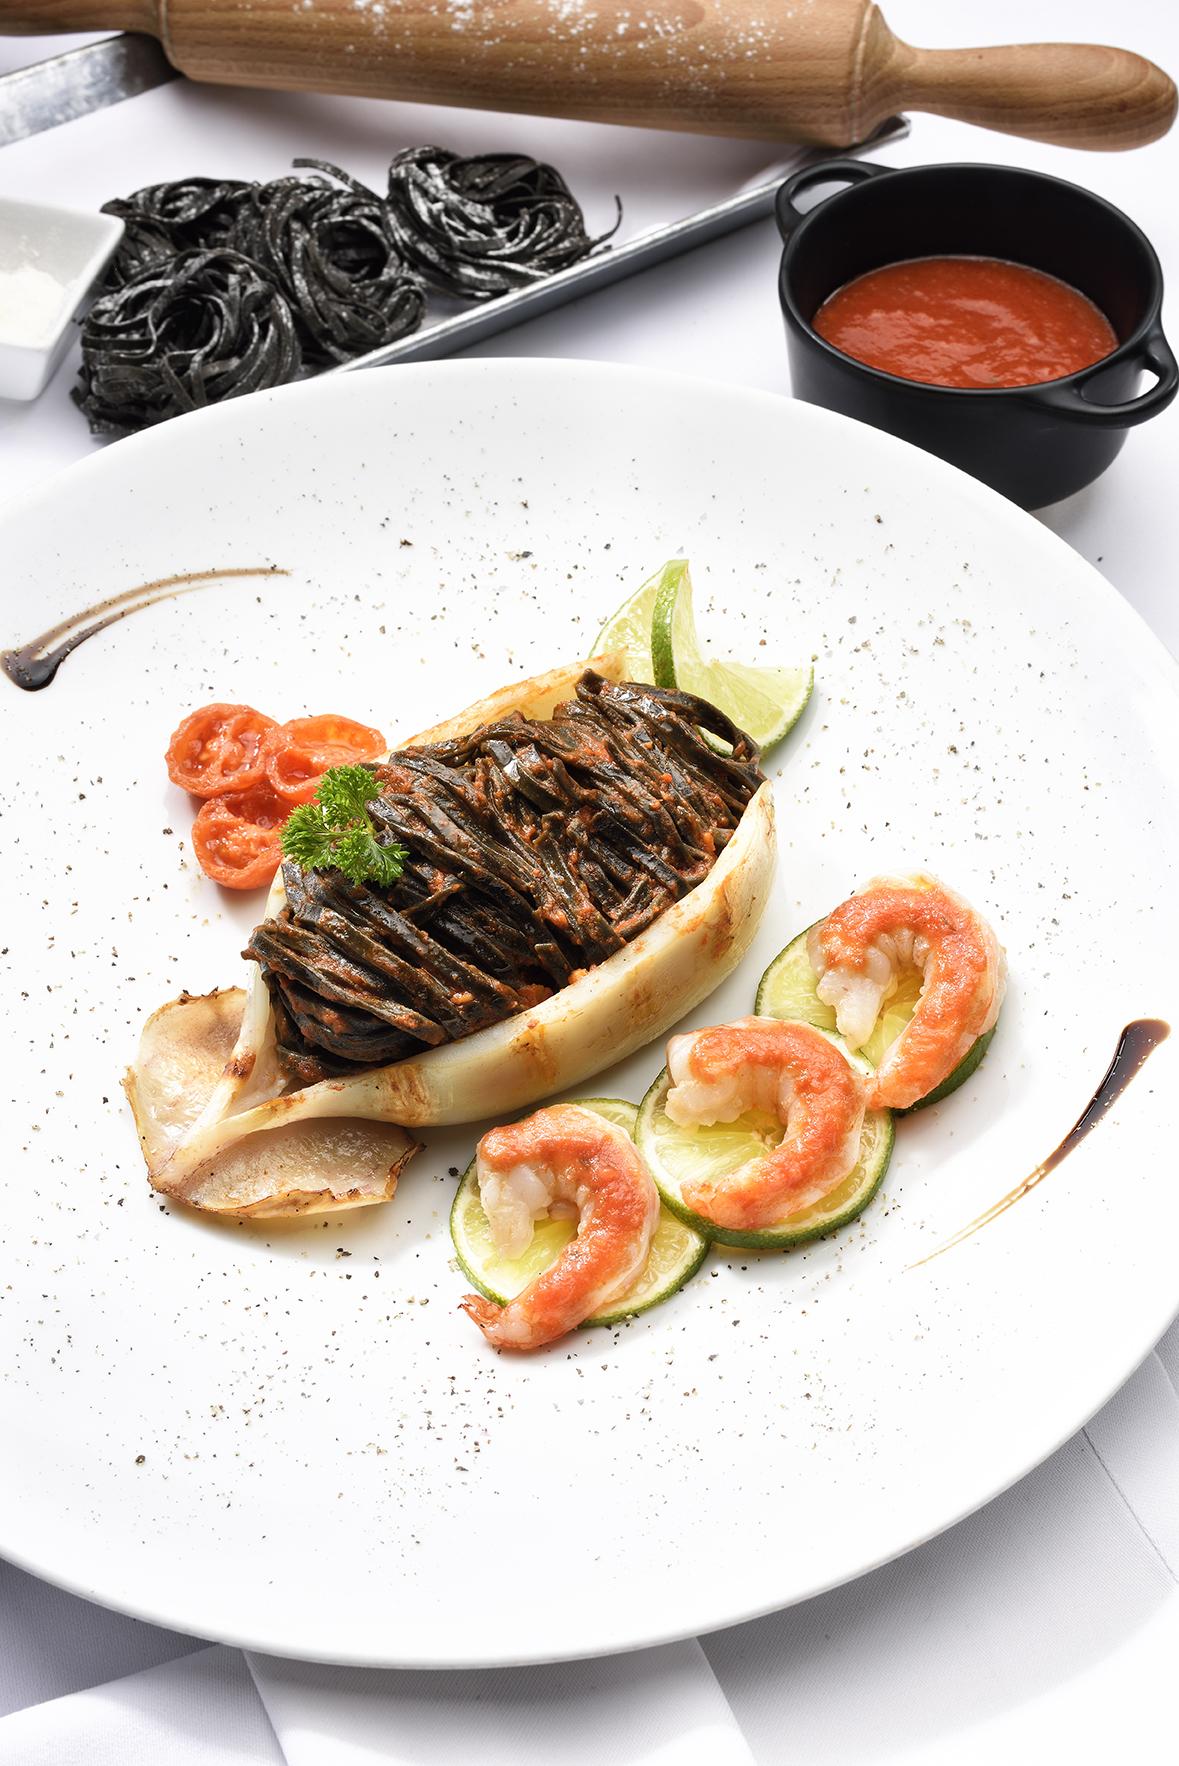 http://sandrorestaurante.com/wp-content/uploads/2017/01/piatto-233.jpg